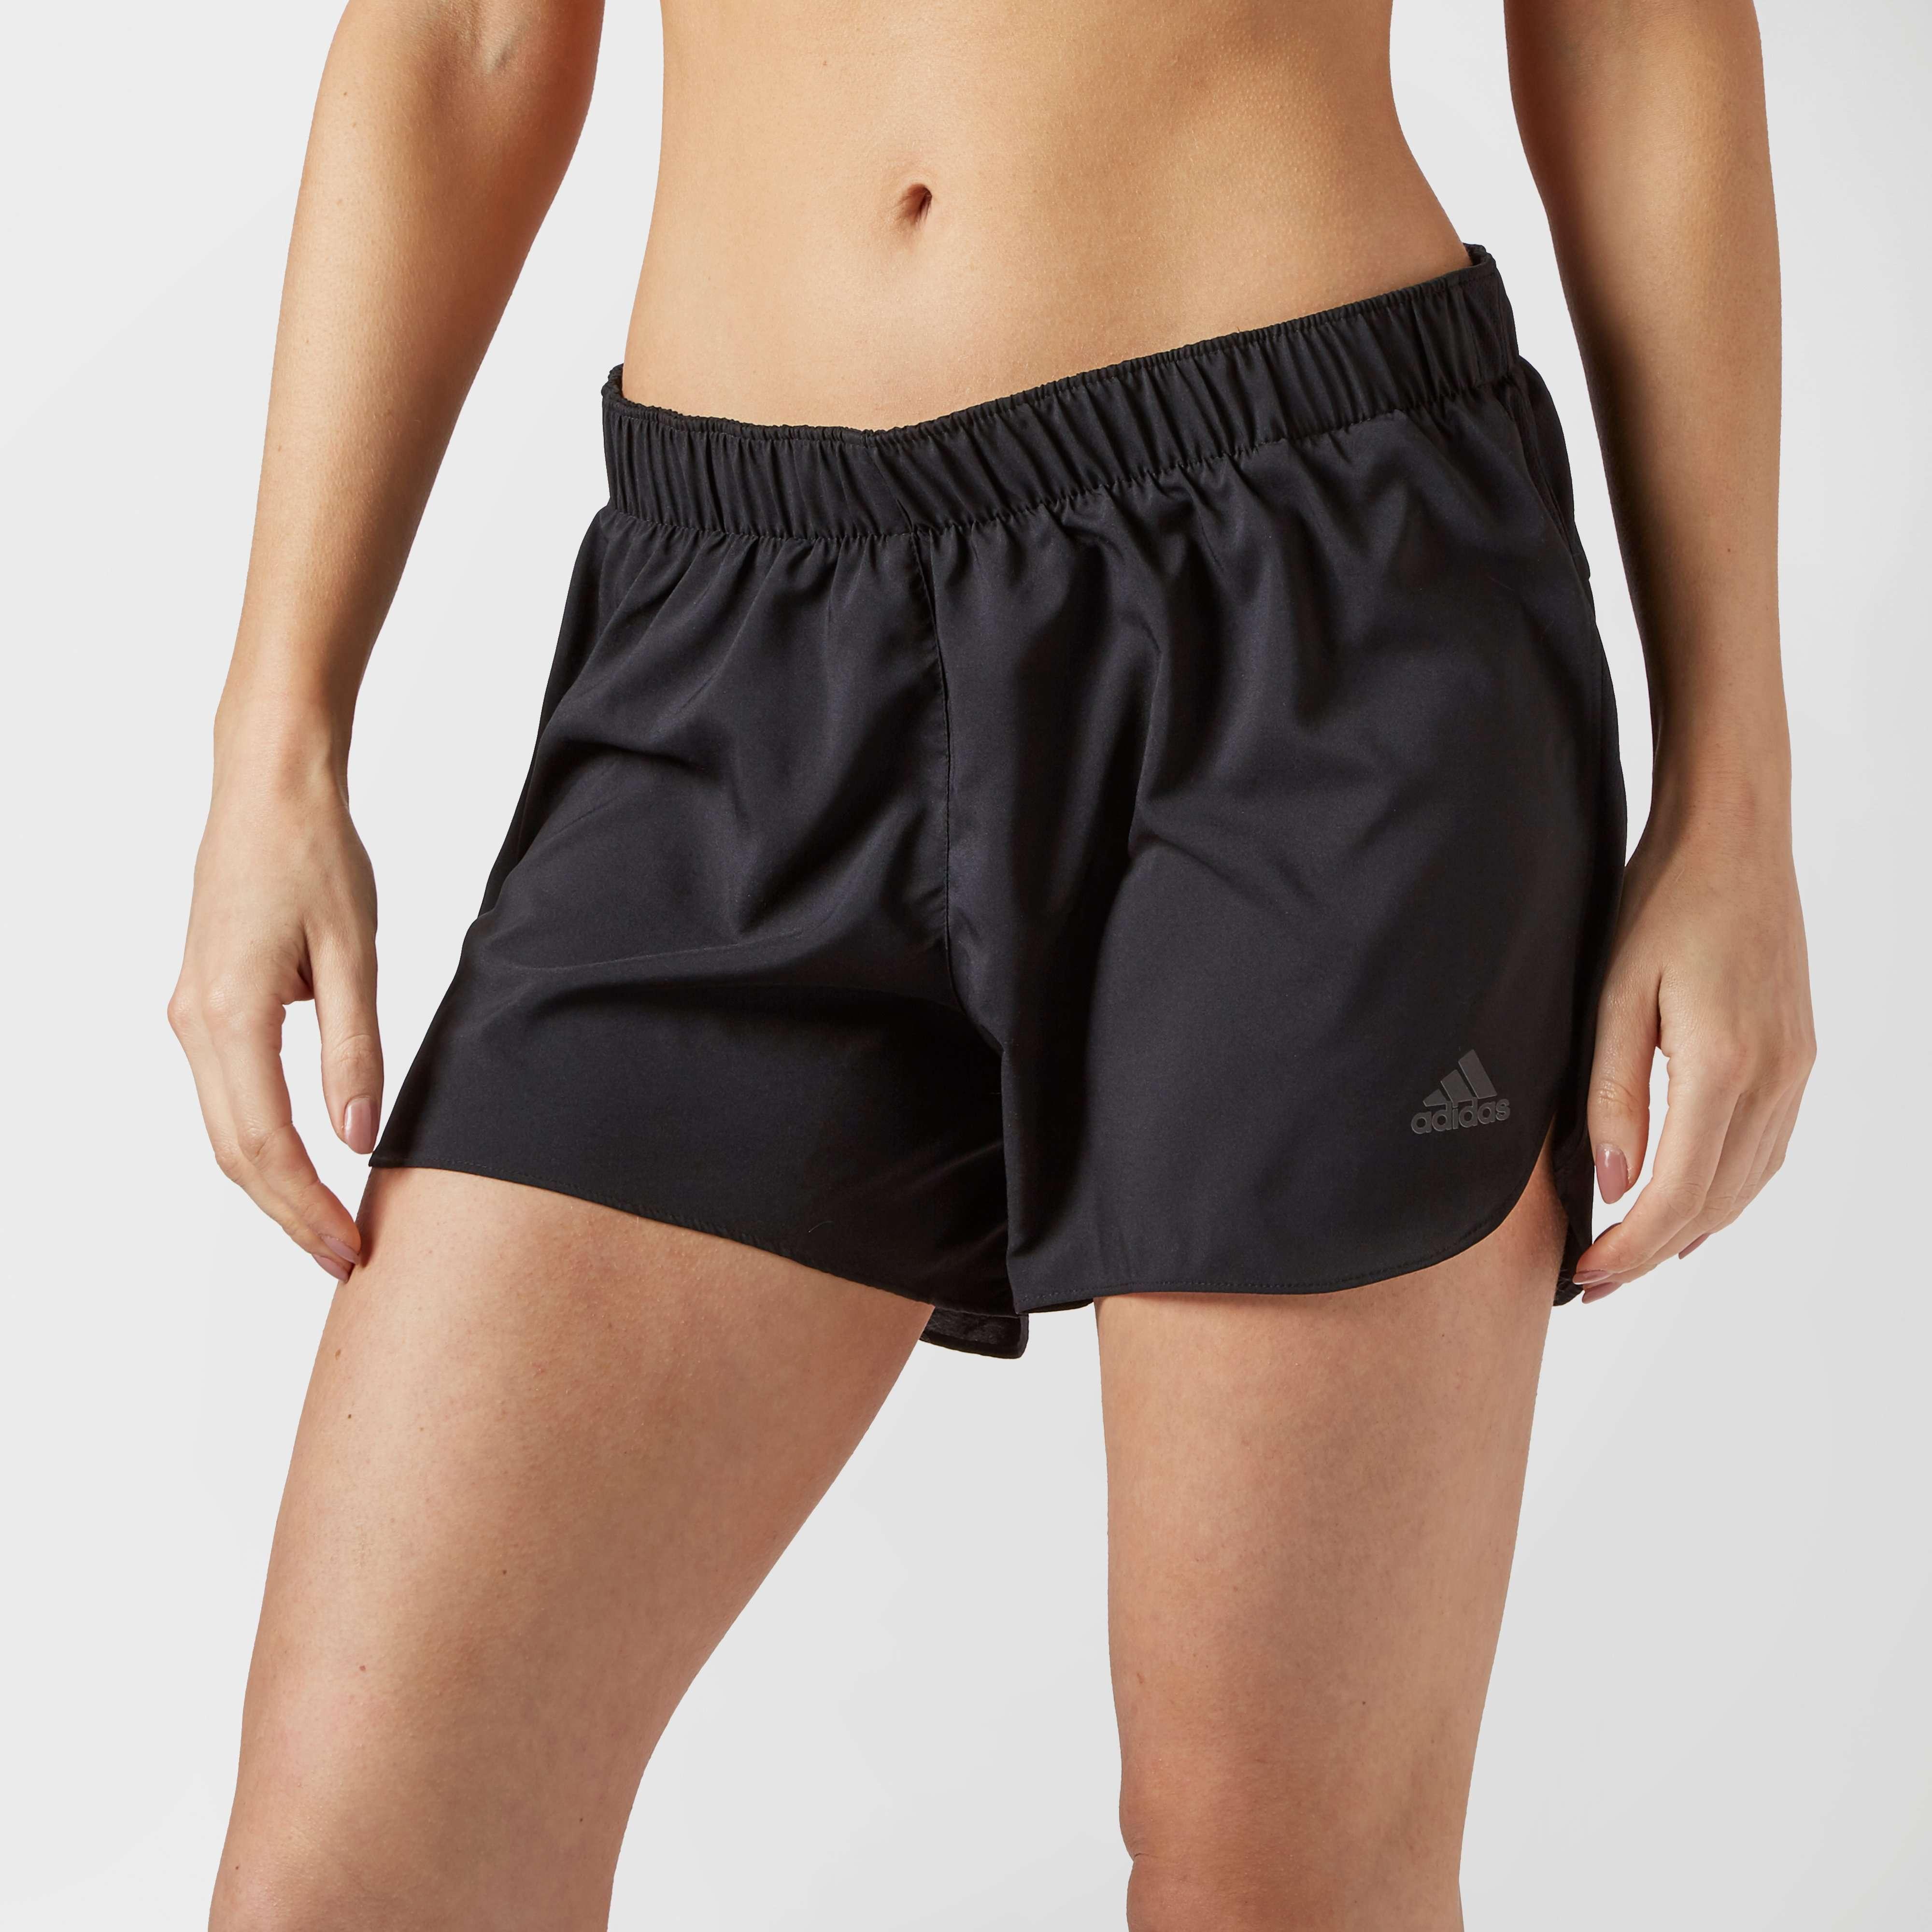 ADIDAS Women's Response Shorts